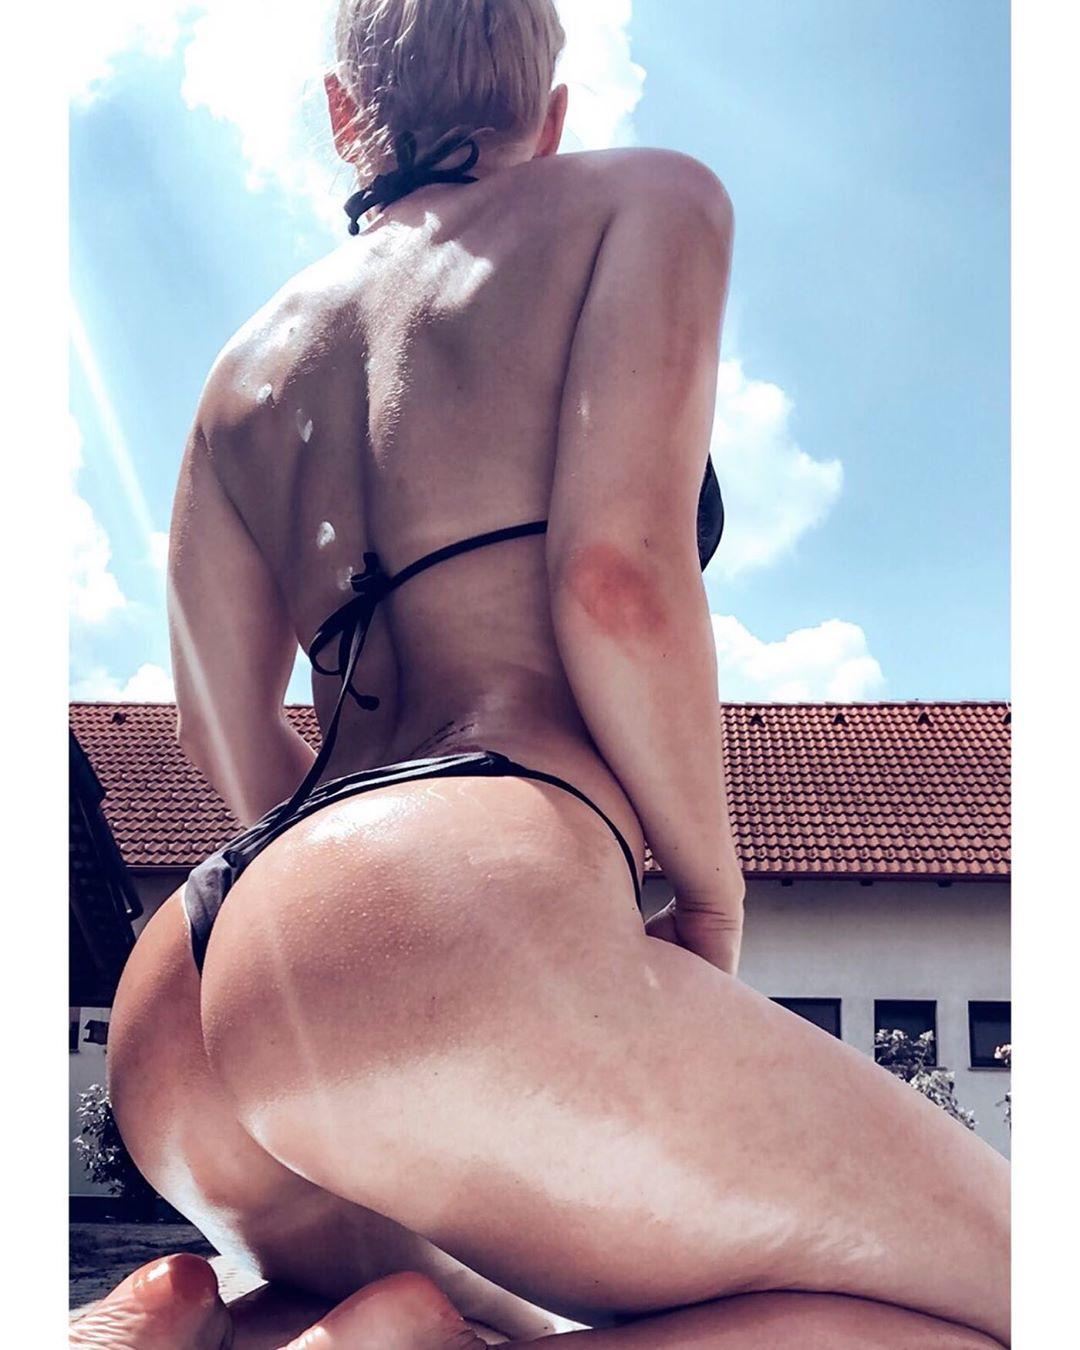 Andreja Rituper tem o melhor rabo do mundo